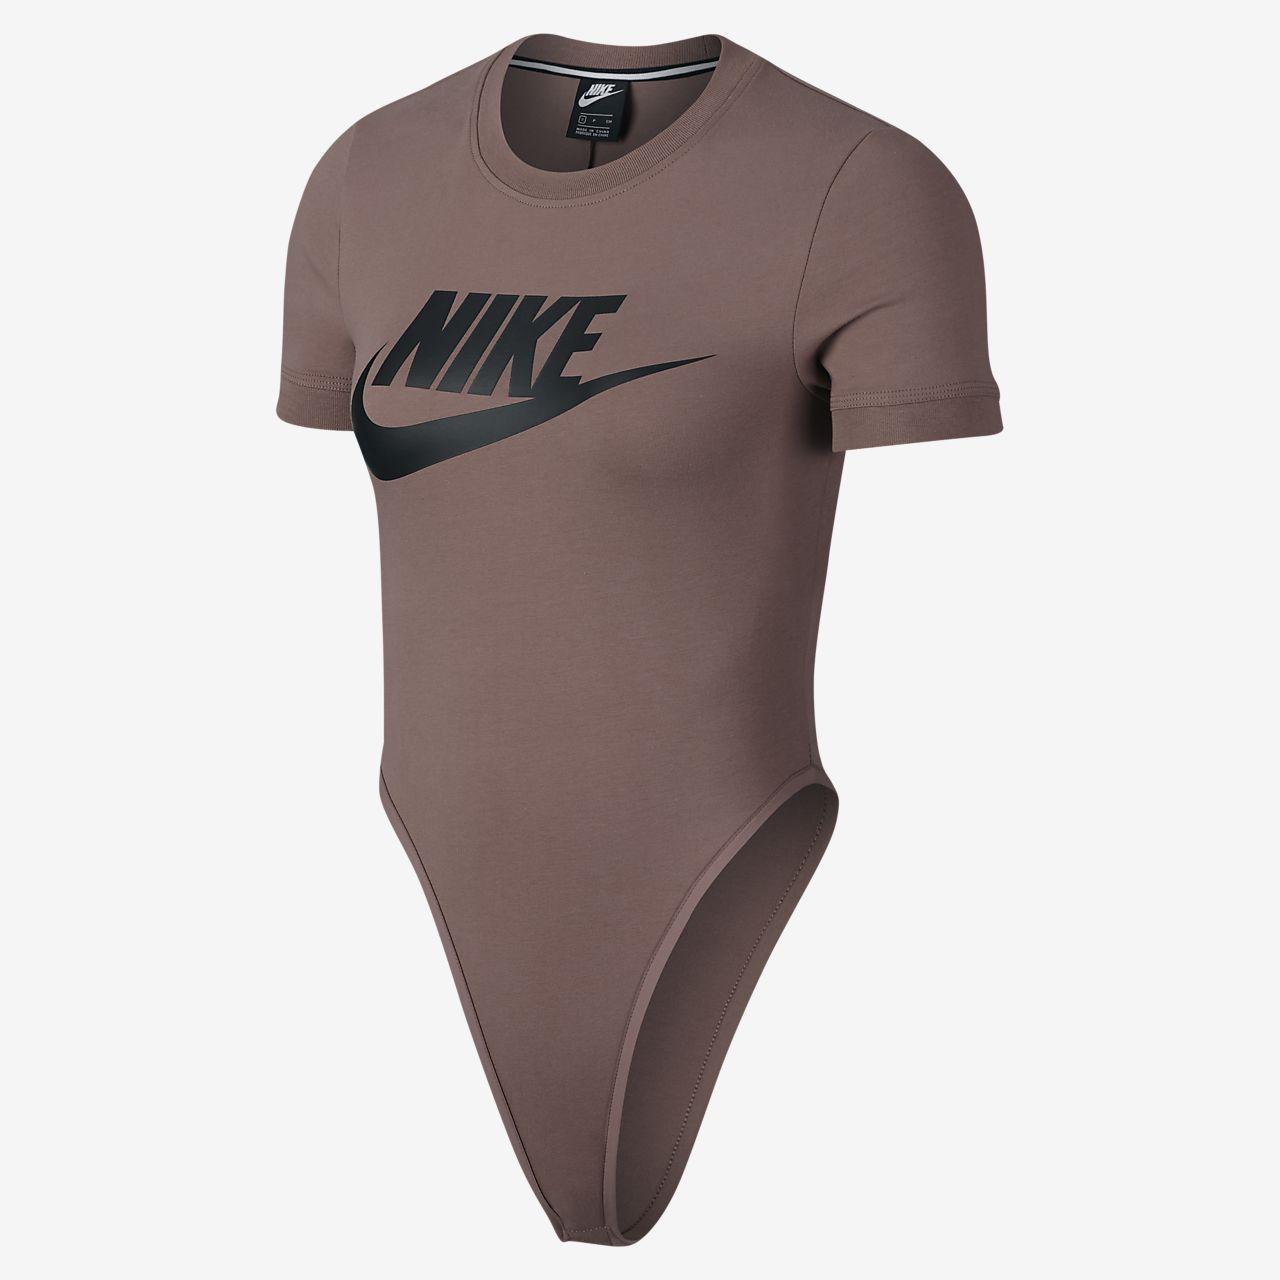 c132b8ba88d1f9 Nike Sportswear Essential Women s Bodysuit. Nike.com CA